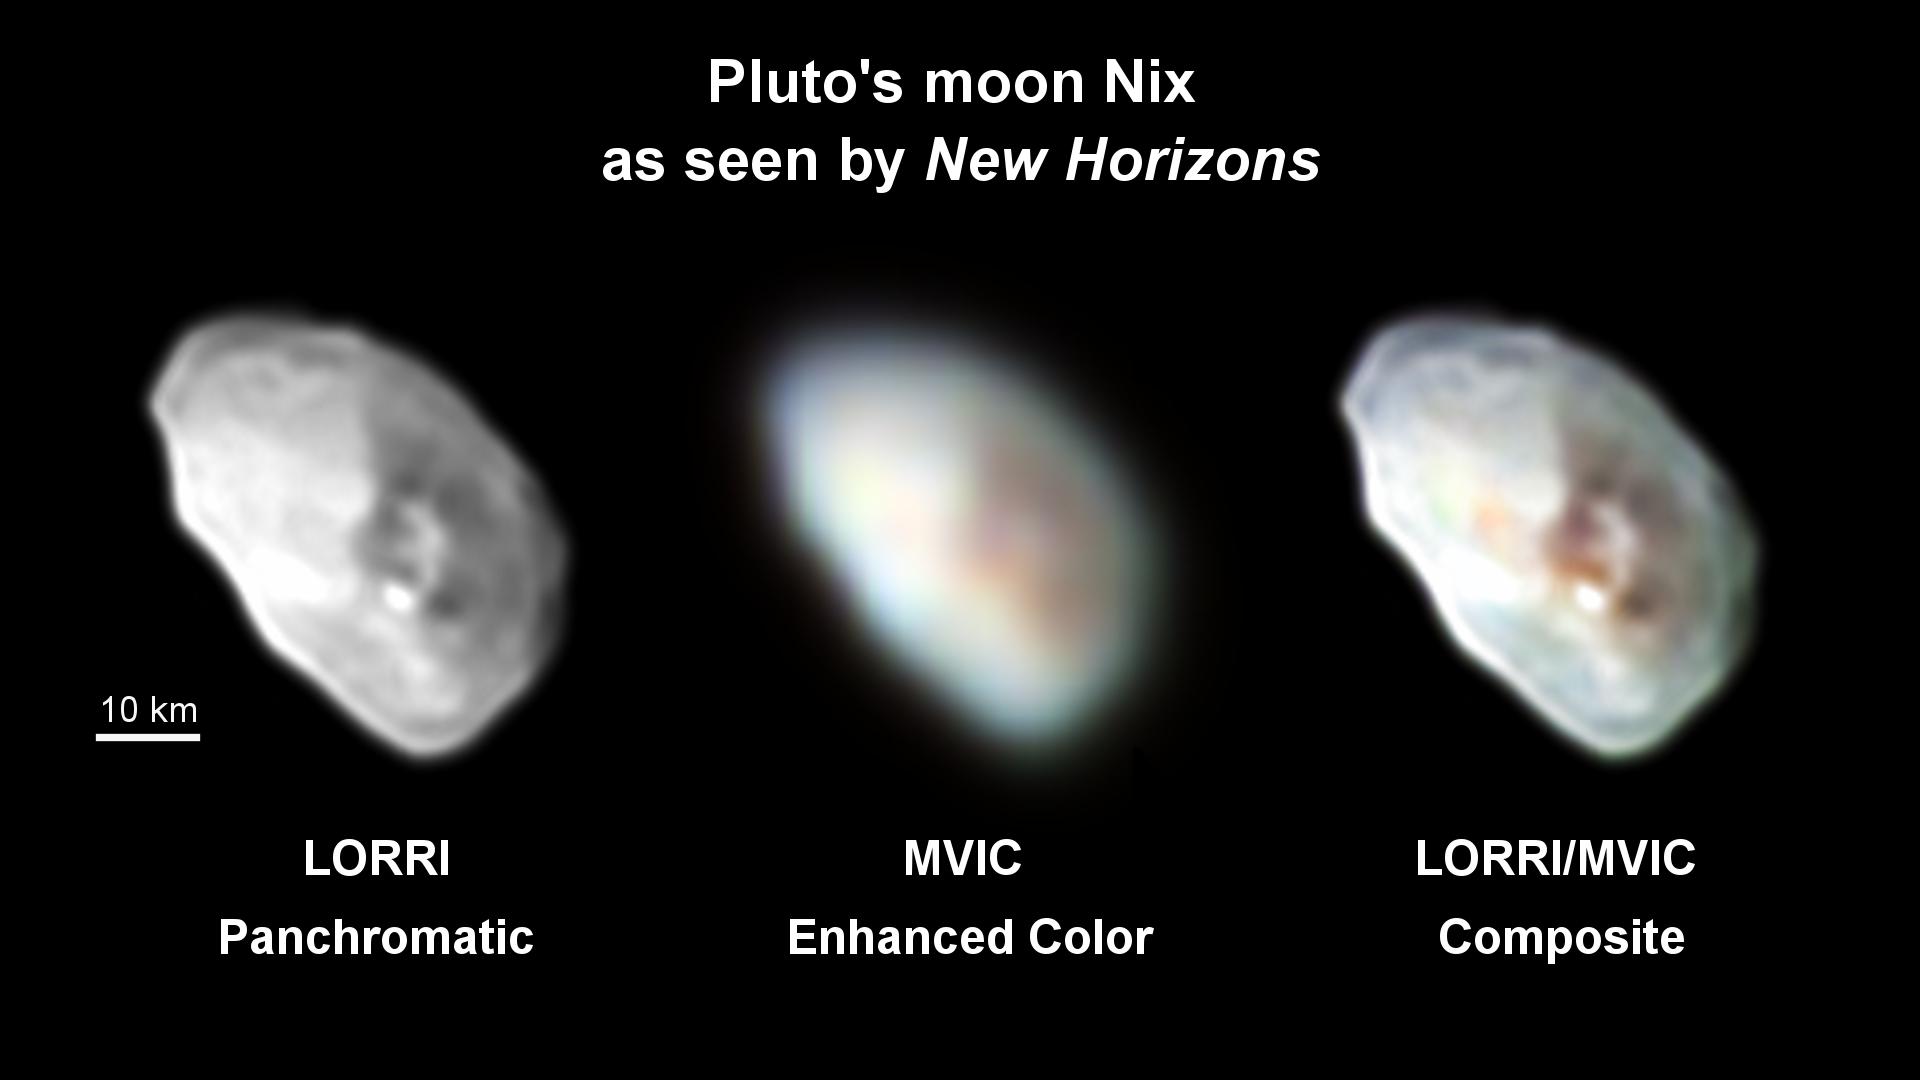 nix pluto planet - photo #22